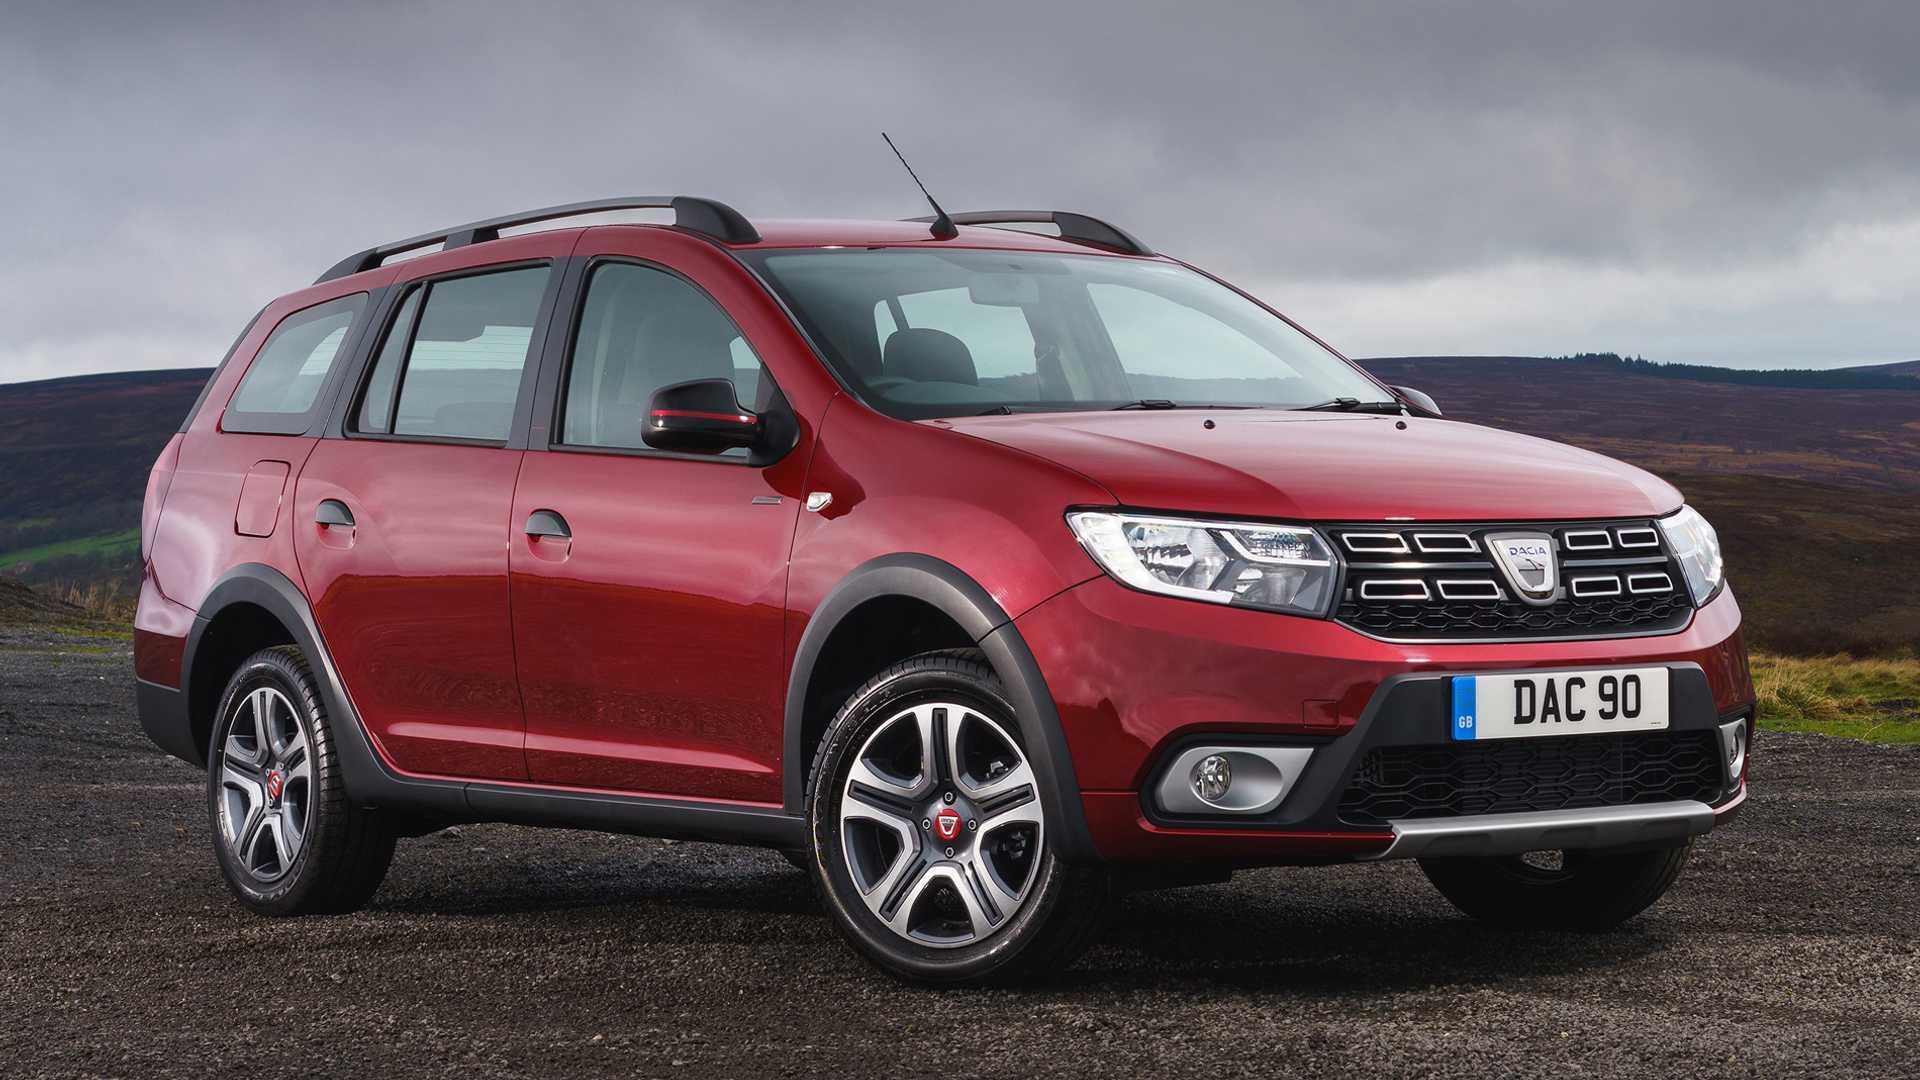 Dacia Sandero - GoodAutoDeals - GoodAutoBlog